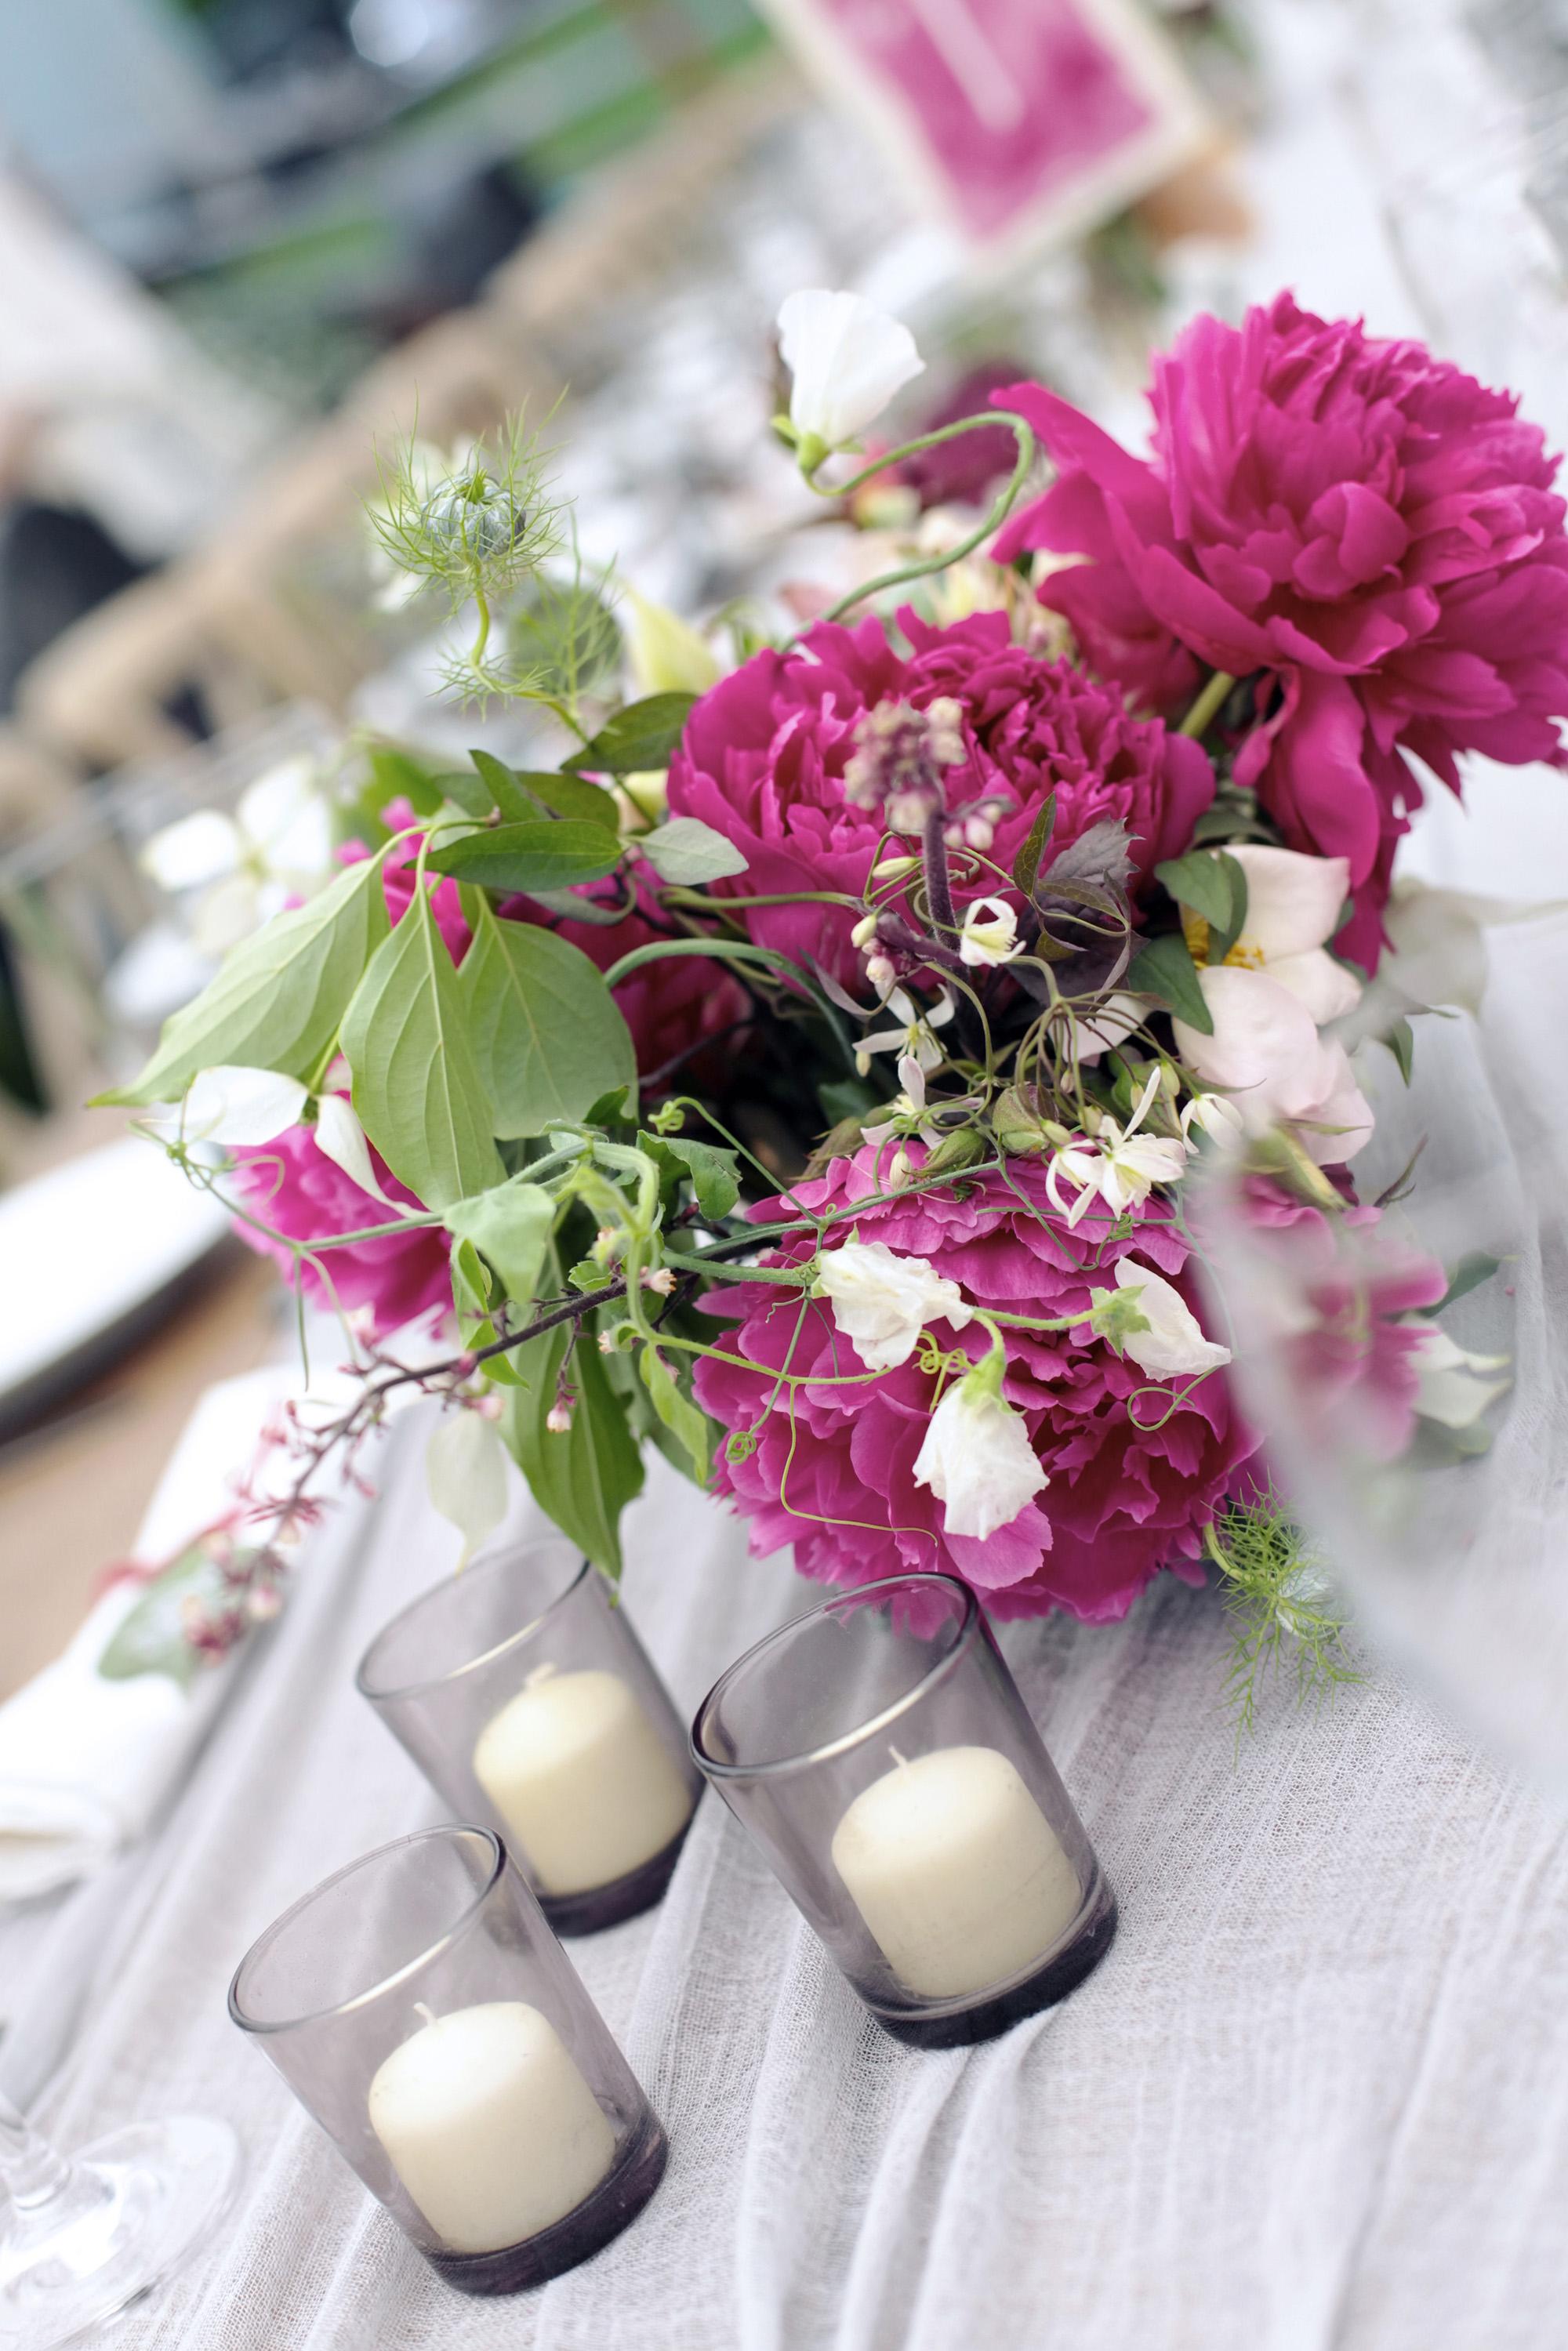 Shannon-Wellington-Delaware-Wedding-Rustic-Home-Wedding15.jpg